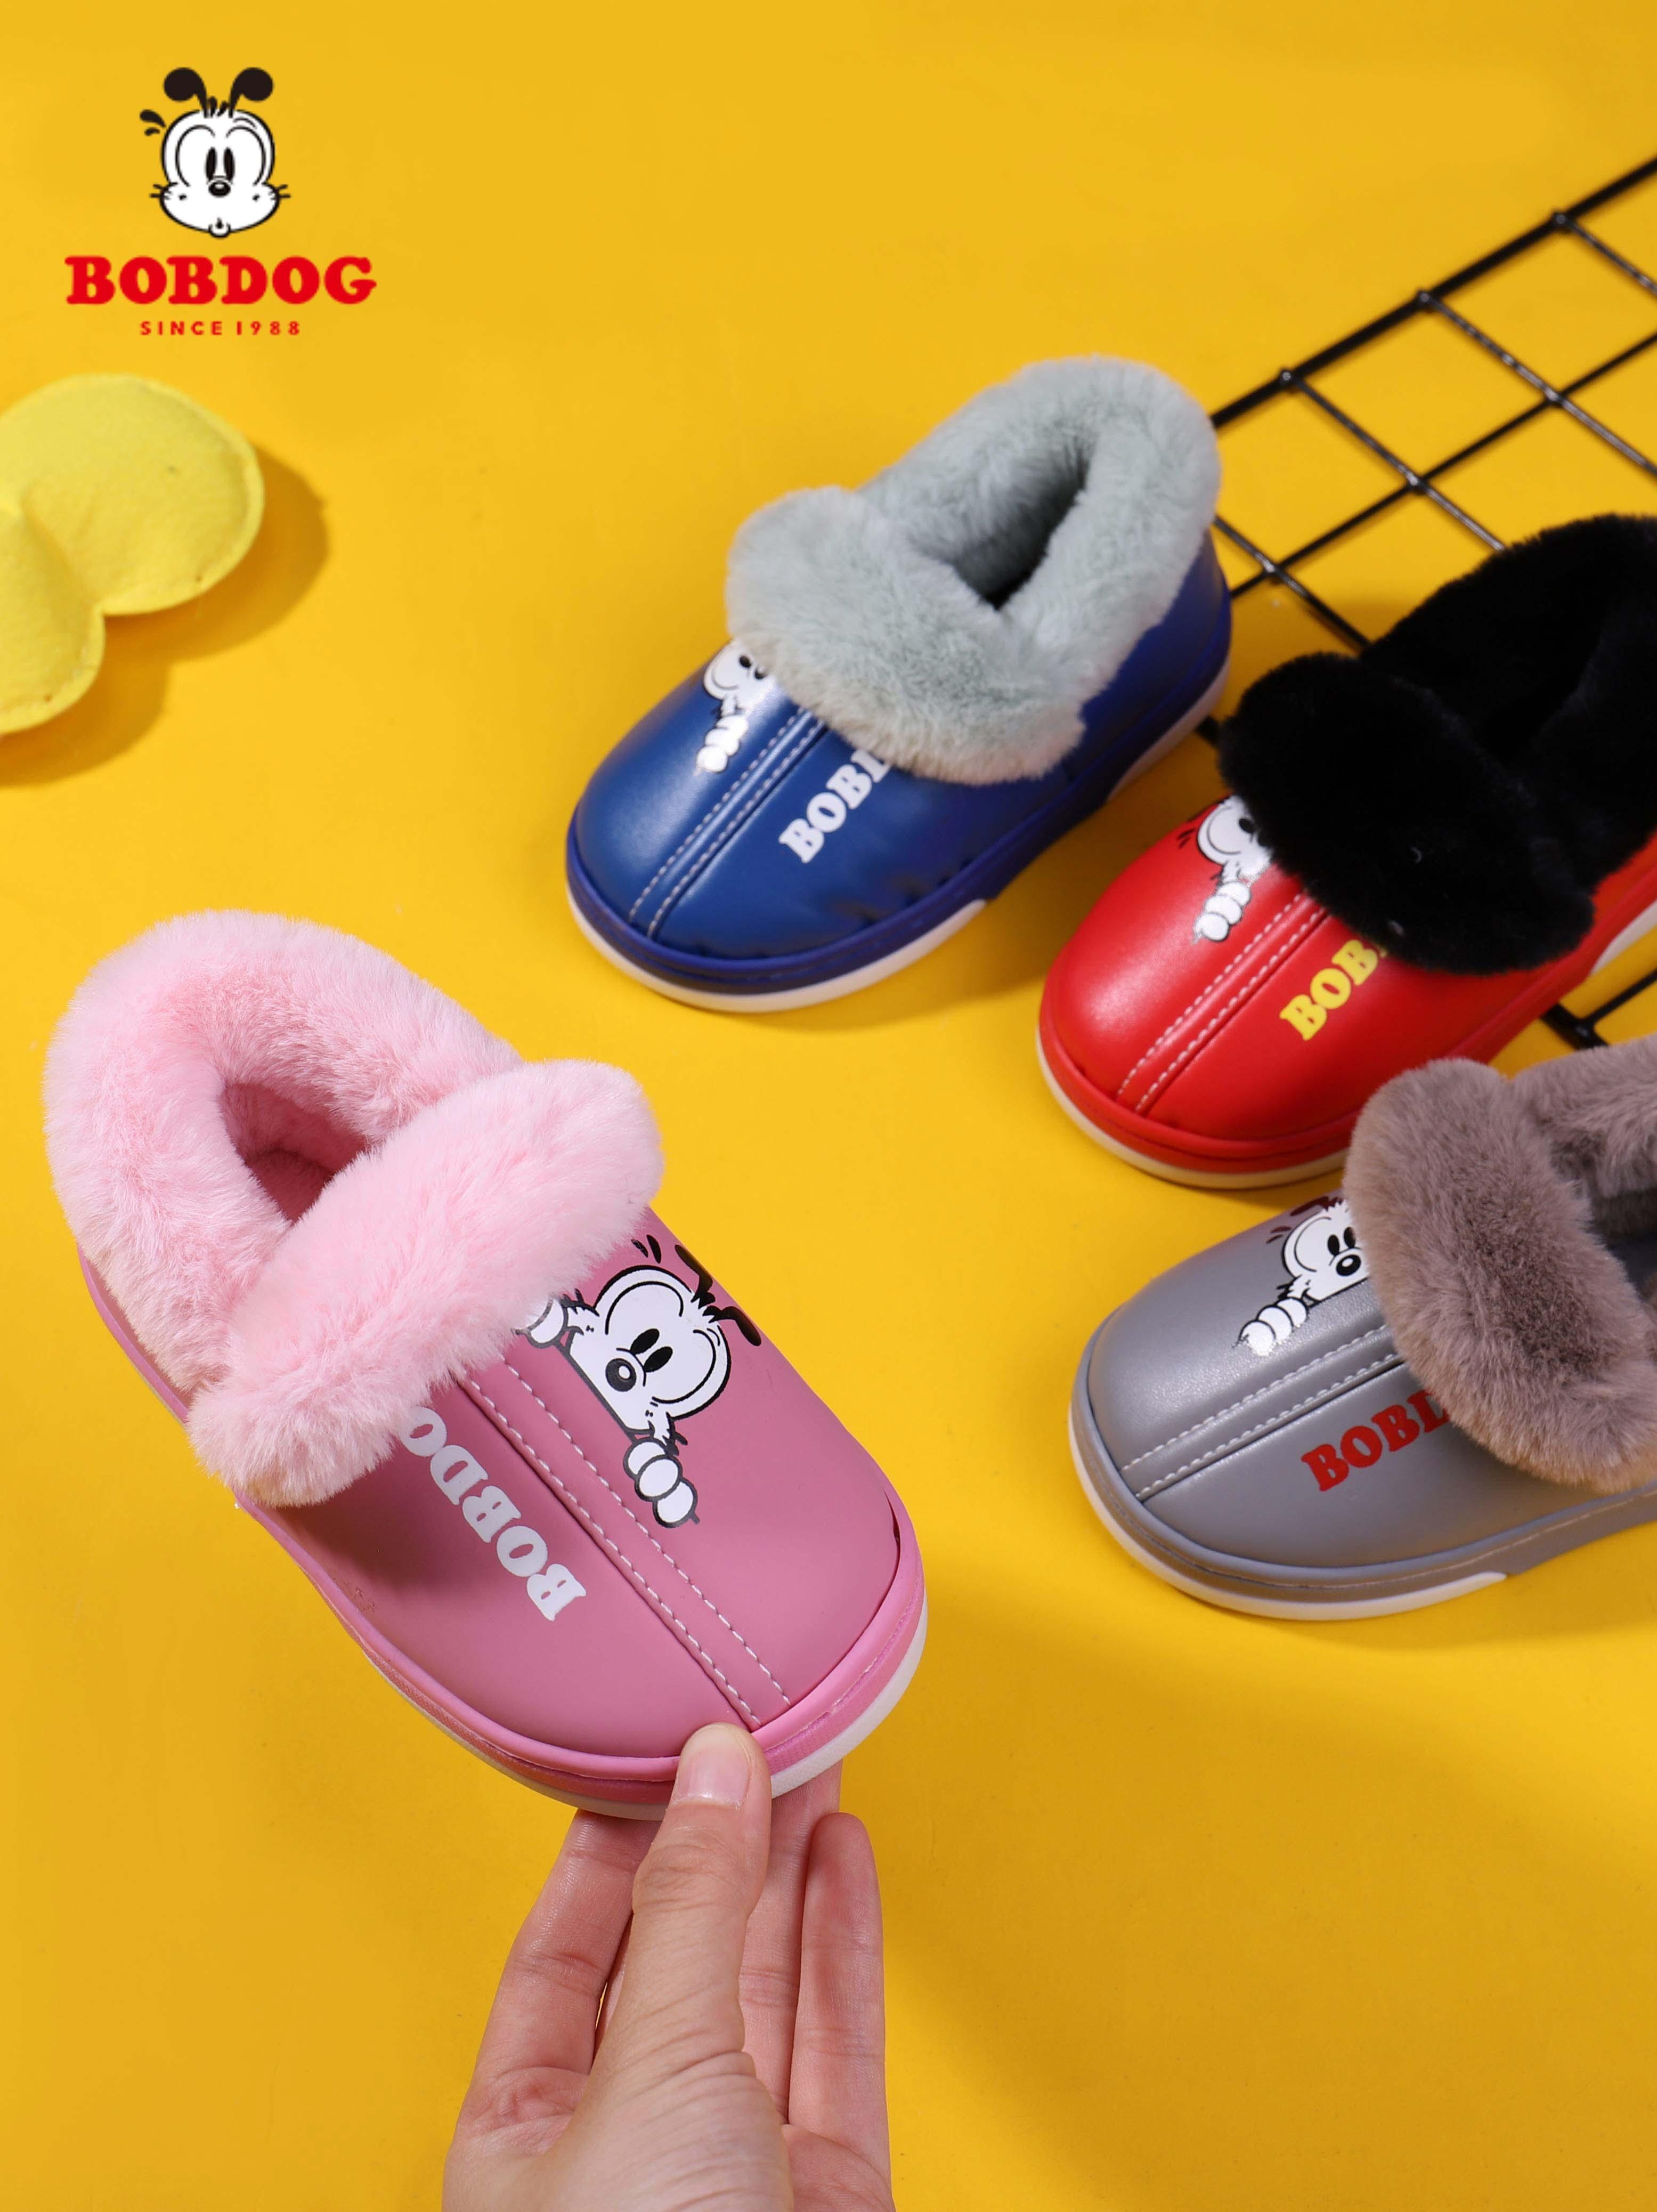 Bobdog 巴布豆 20年秋冬款 加绒保暖 儿童棉鞋 天猫优惠券折后¥25.8包邮(¥35.8-10)内长14-27cm多色可选